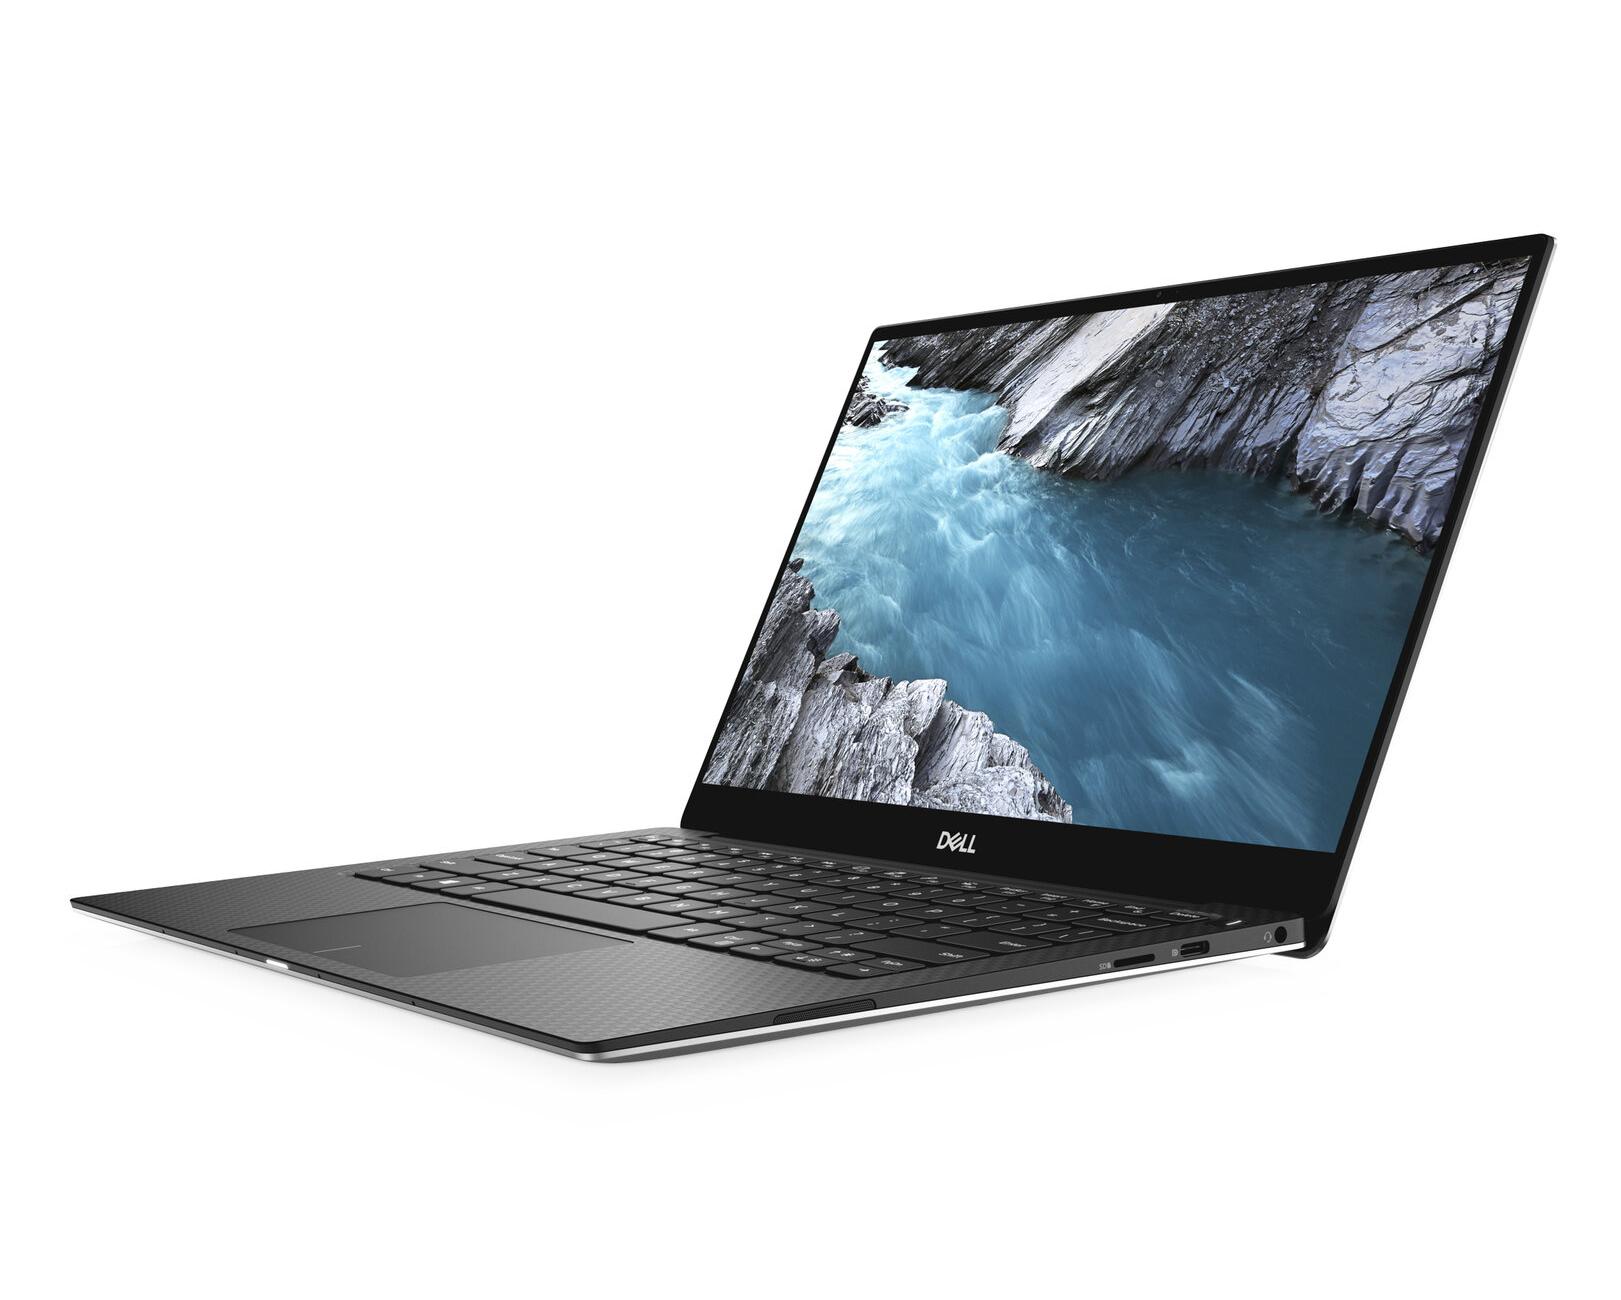 Dell XPS 13 9380 2019 (i5-8265U, 256GB, UHD) Subnotebook